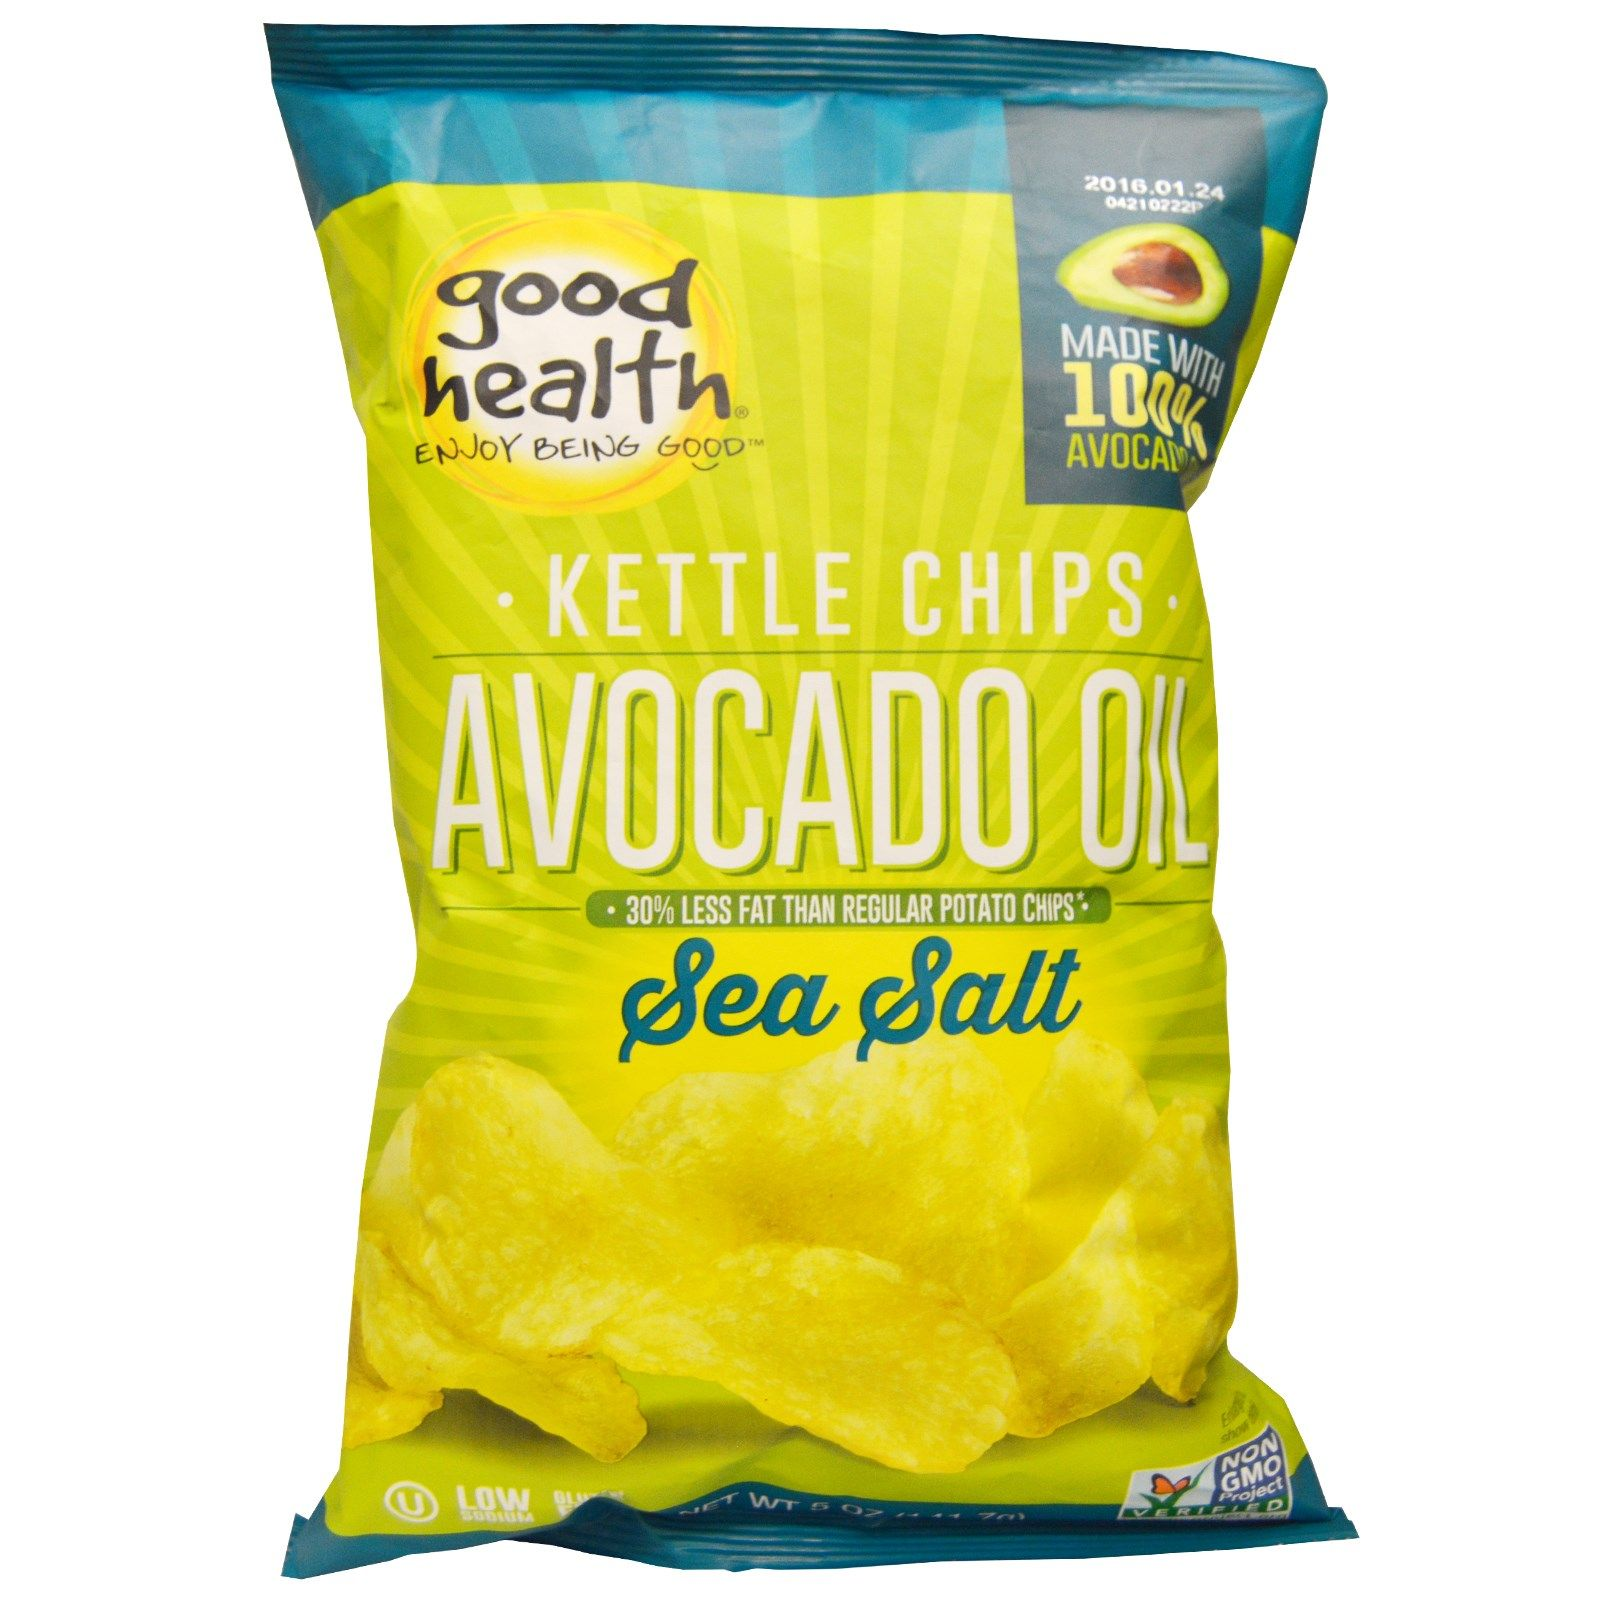 For a Treat, Potatoes, Avocado Oil, Sea Salt... that's it